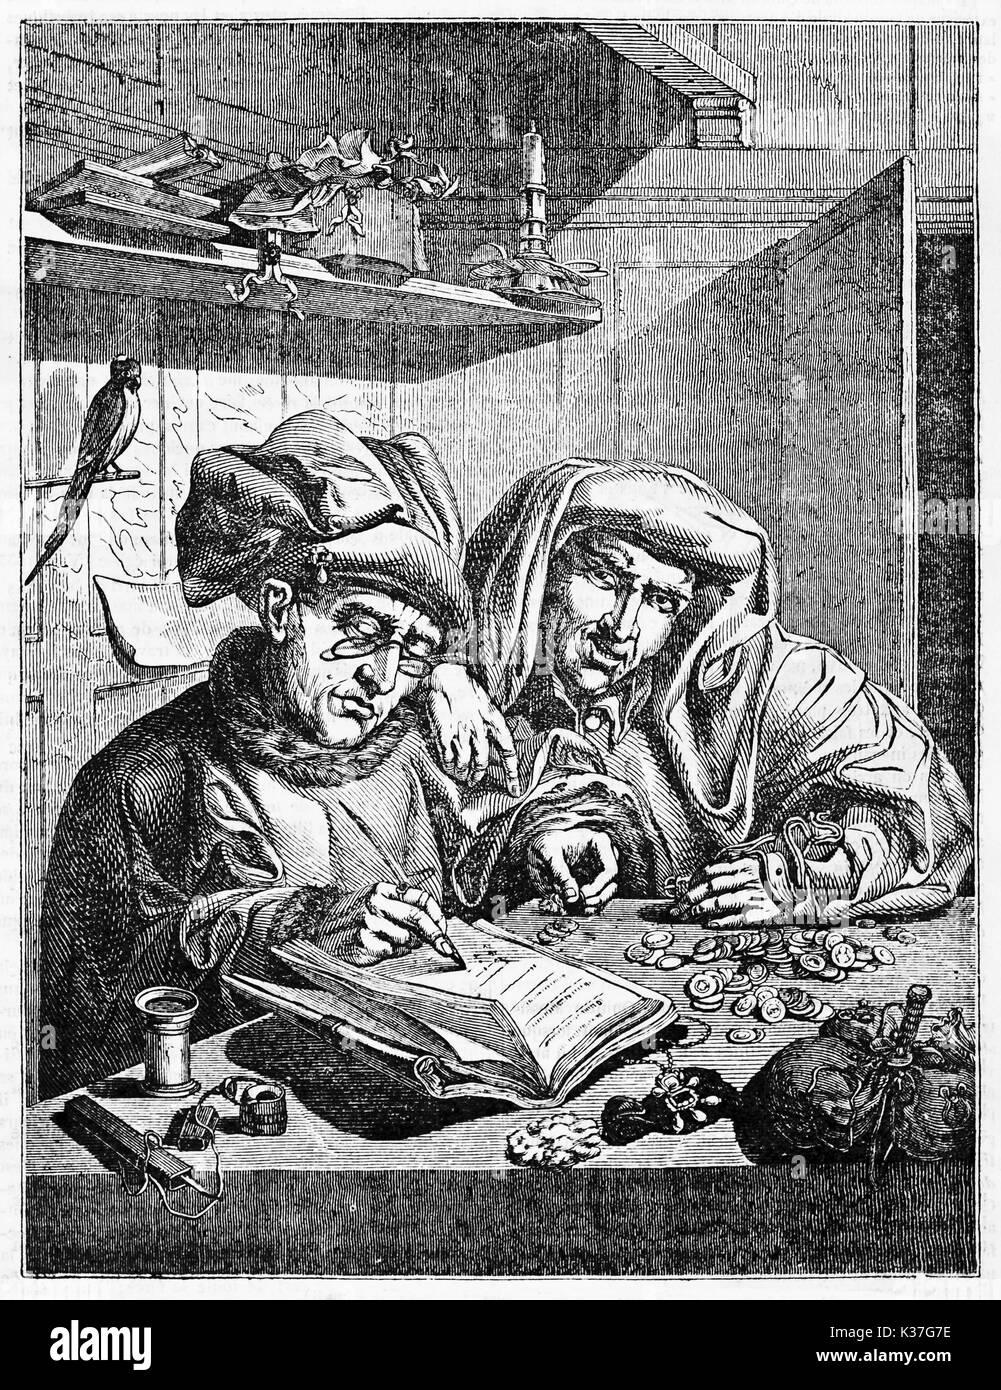 Master Engravers of Fifteenth Century Germany Essay